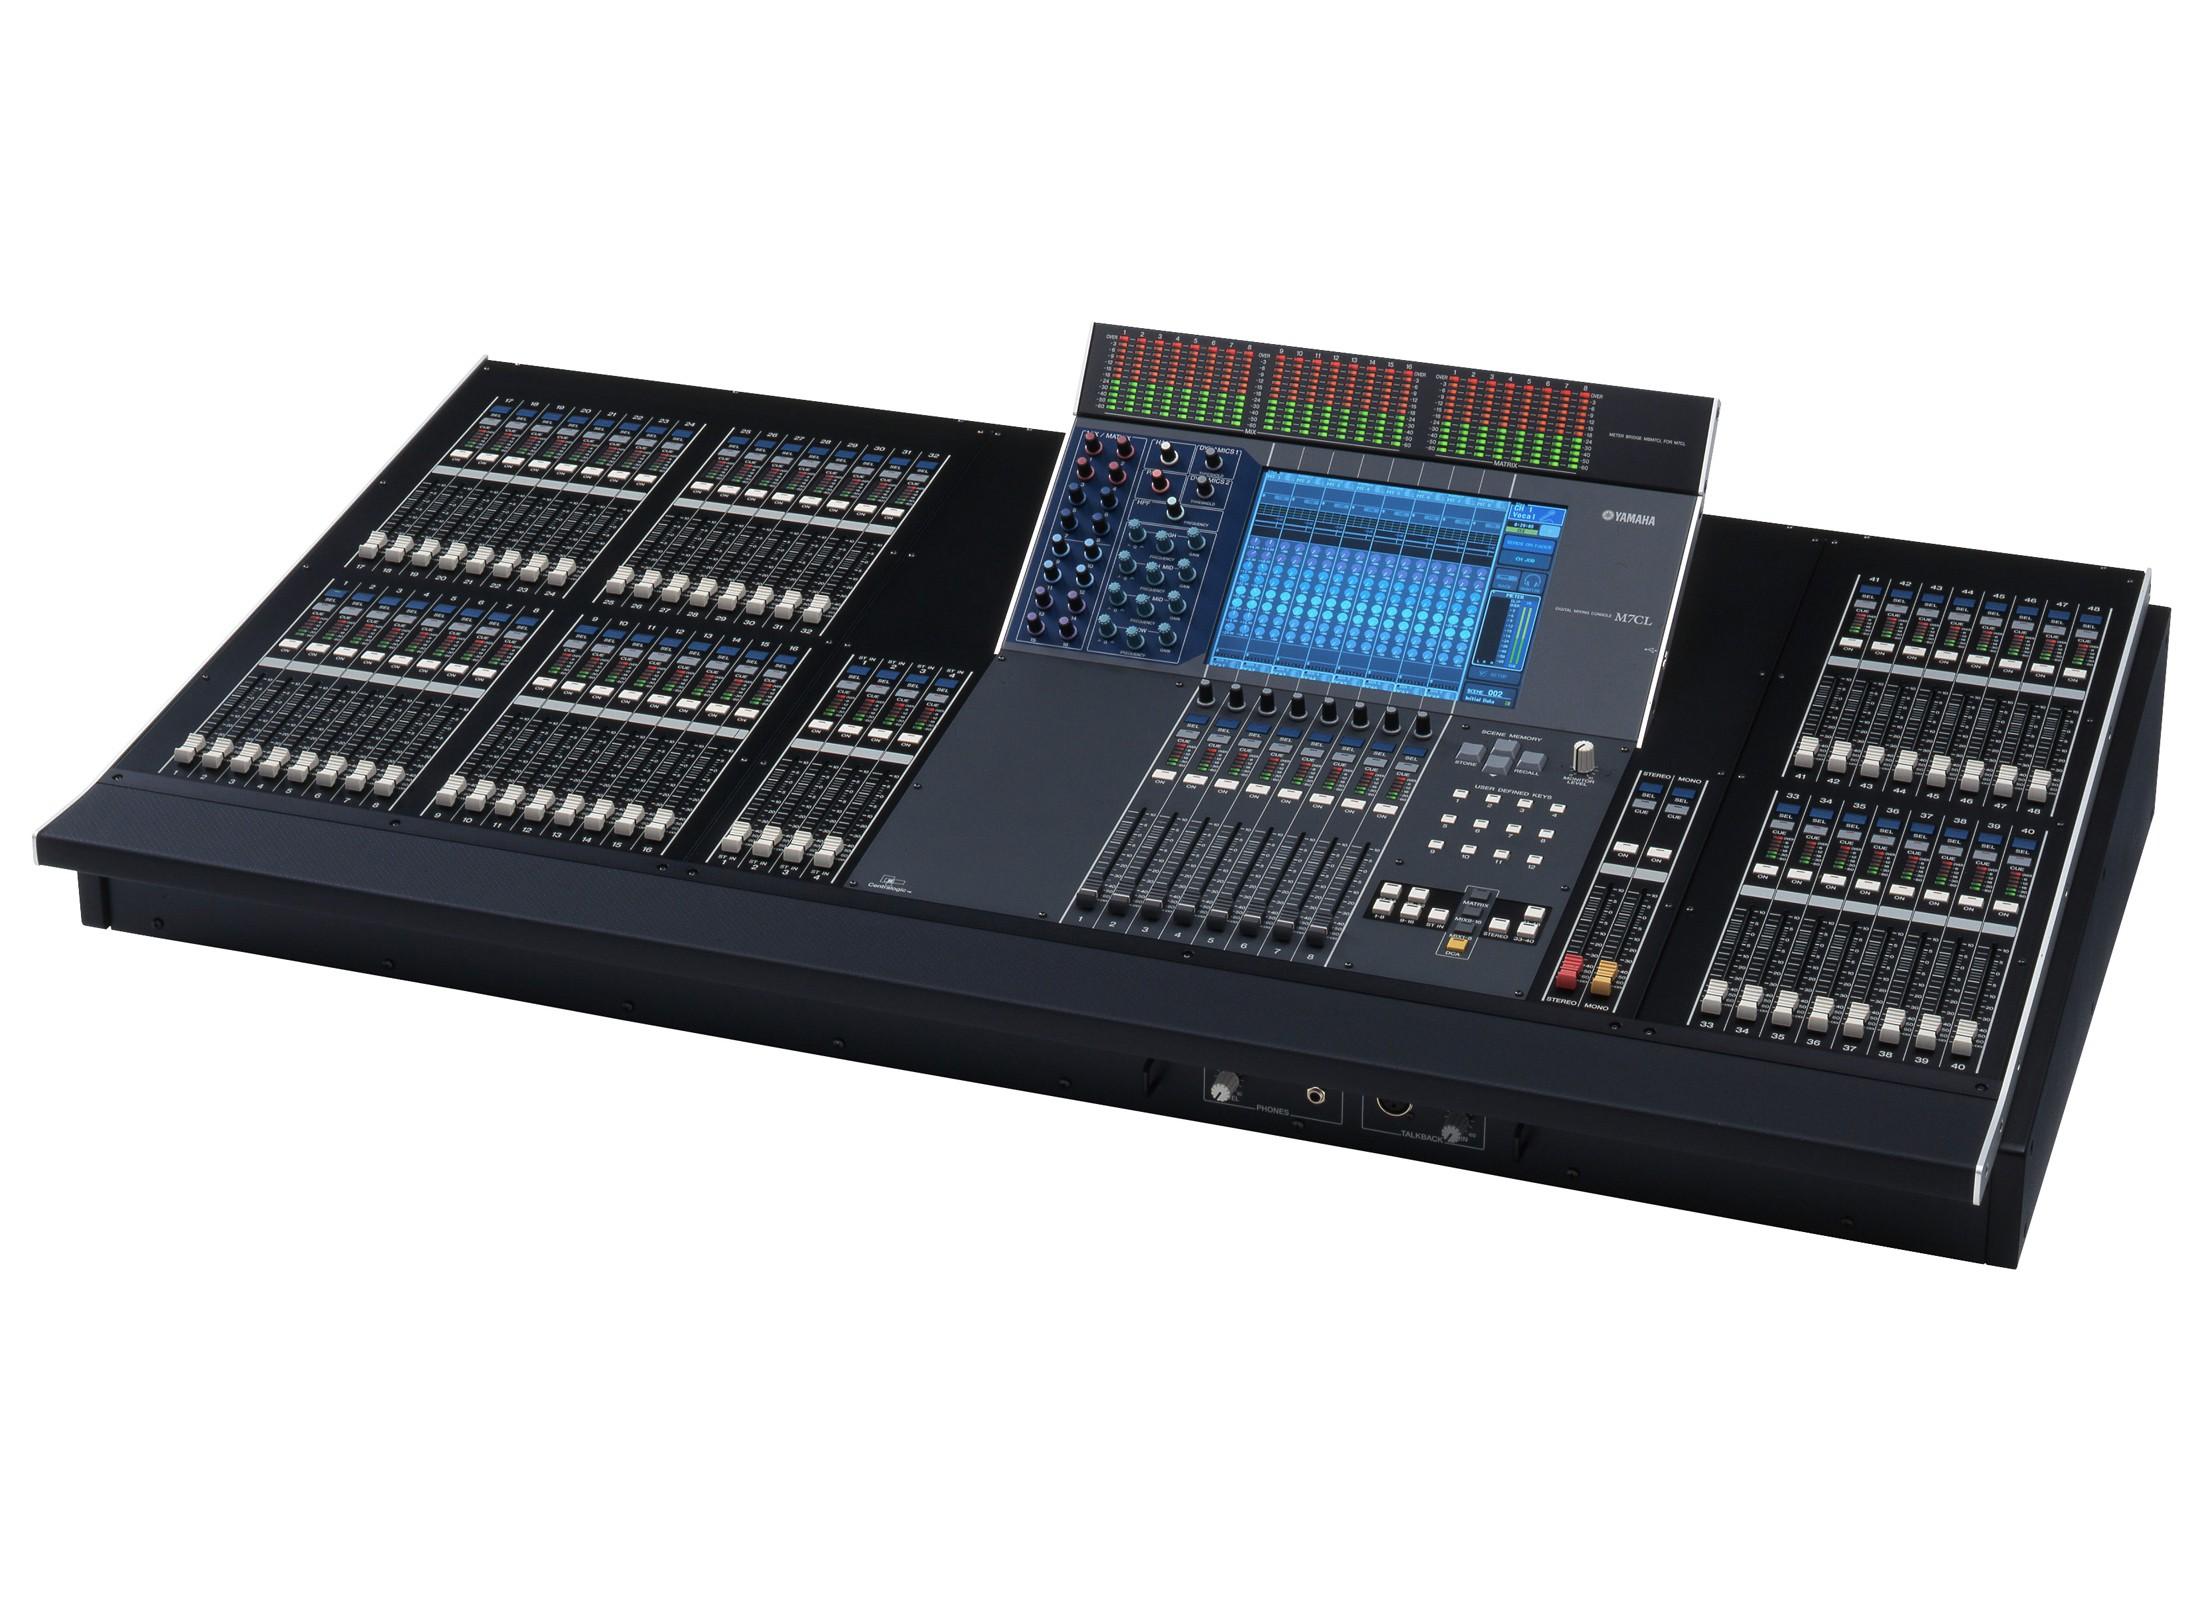 yamaha m7cl48 digital mixer at huss light sound. Black Bedroom Furniture Sets. Home Design Ideas